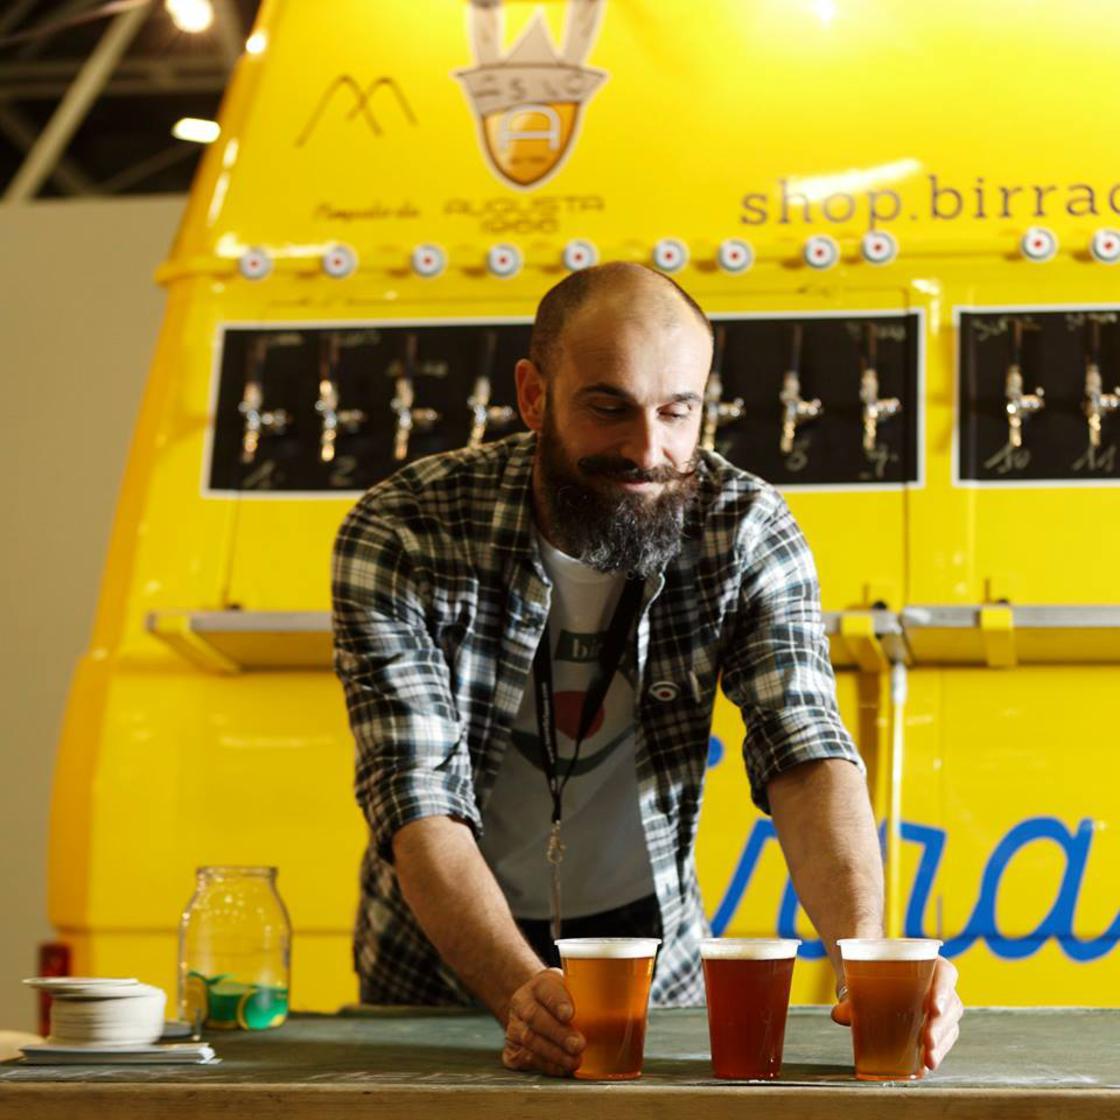 Birrabus – A former school bus transformed into a beer truck!